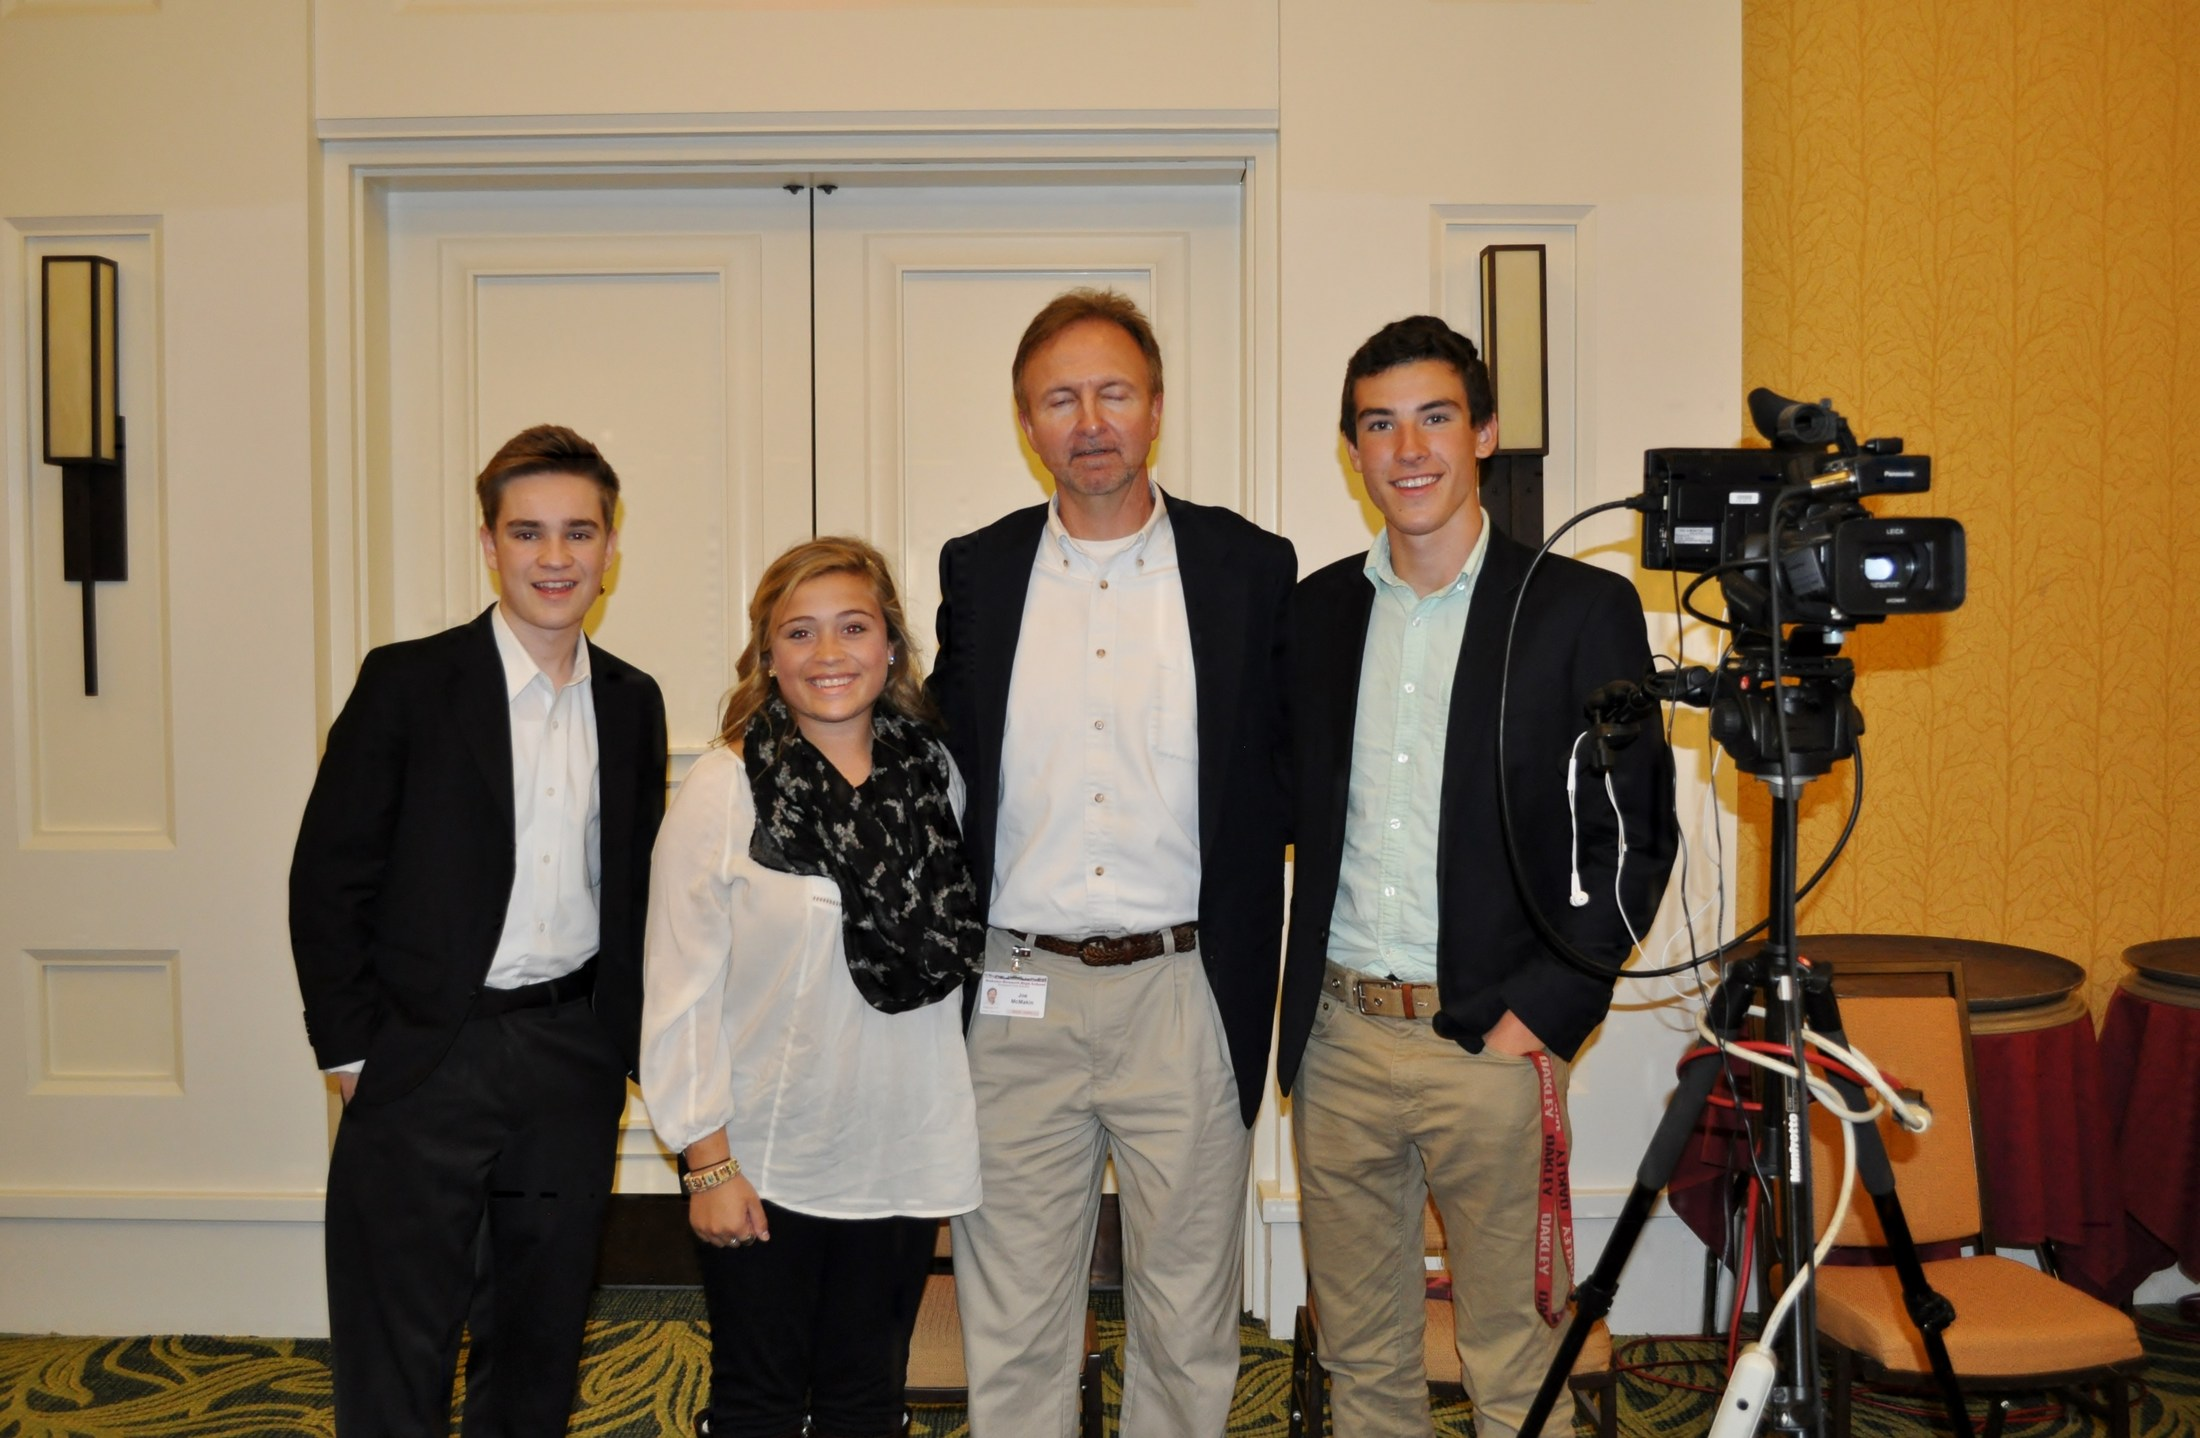 DBHS Broadcasting teacher Joe McMakin & students